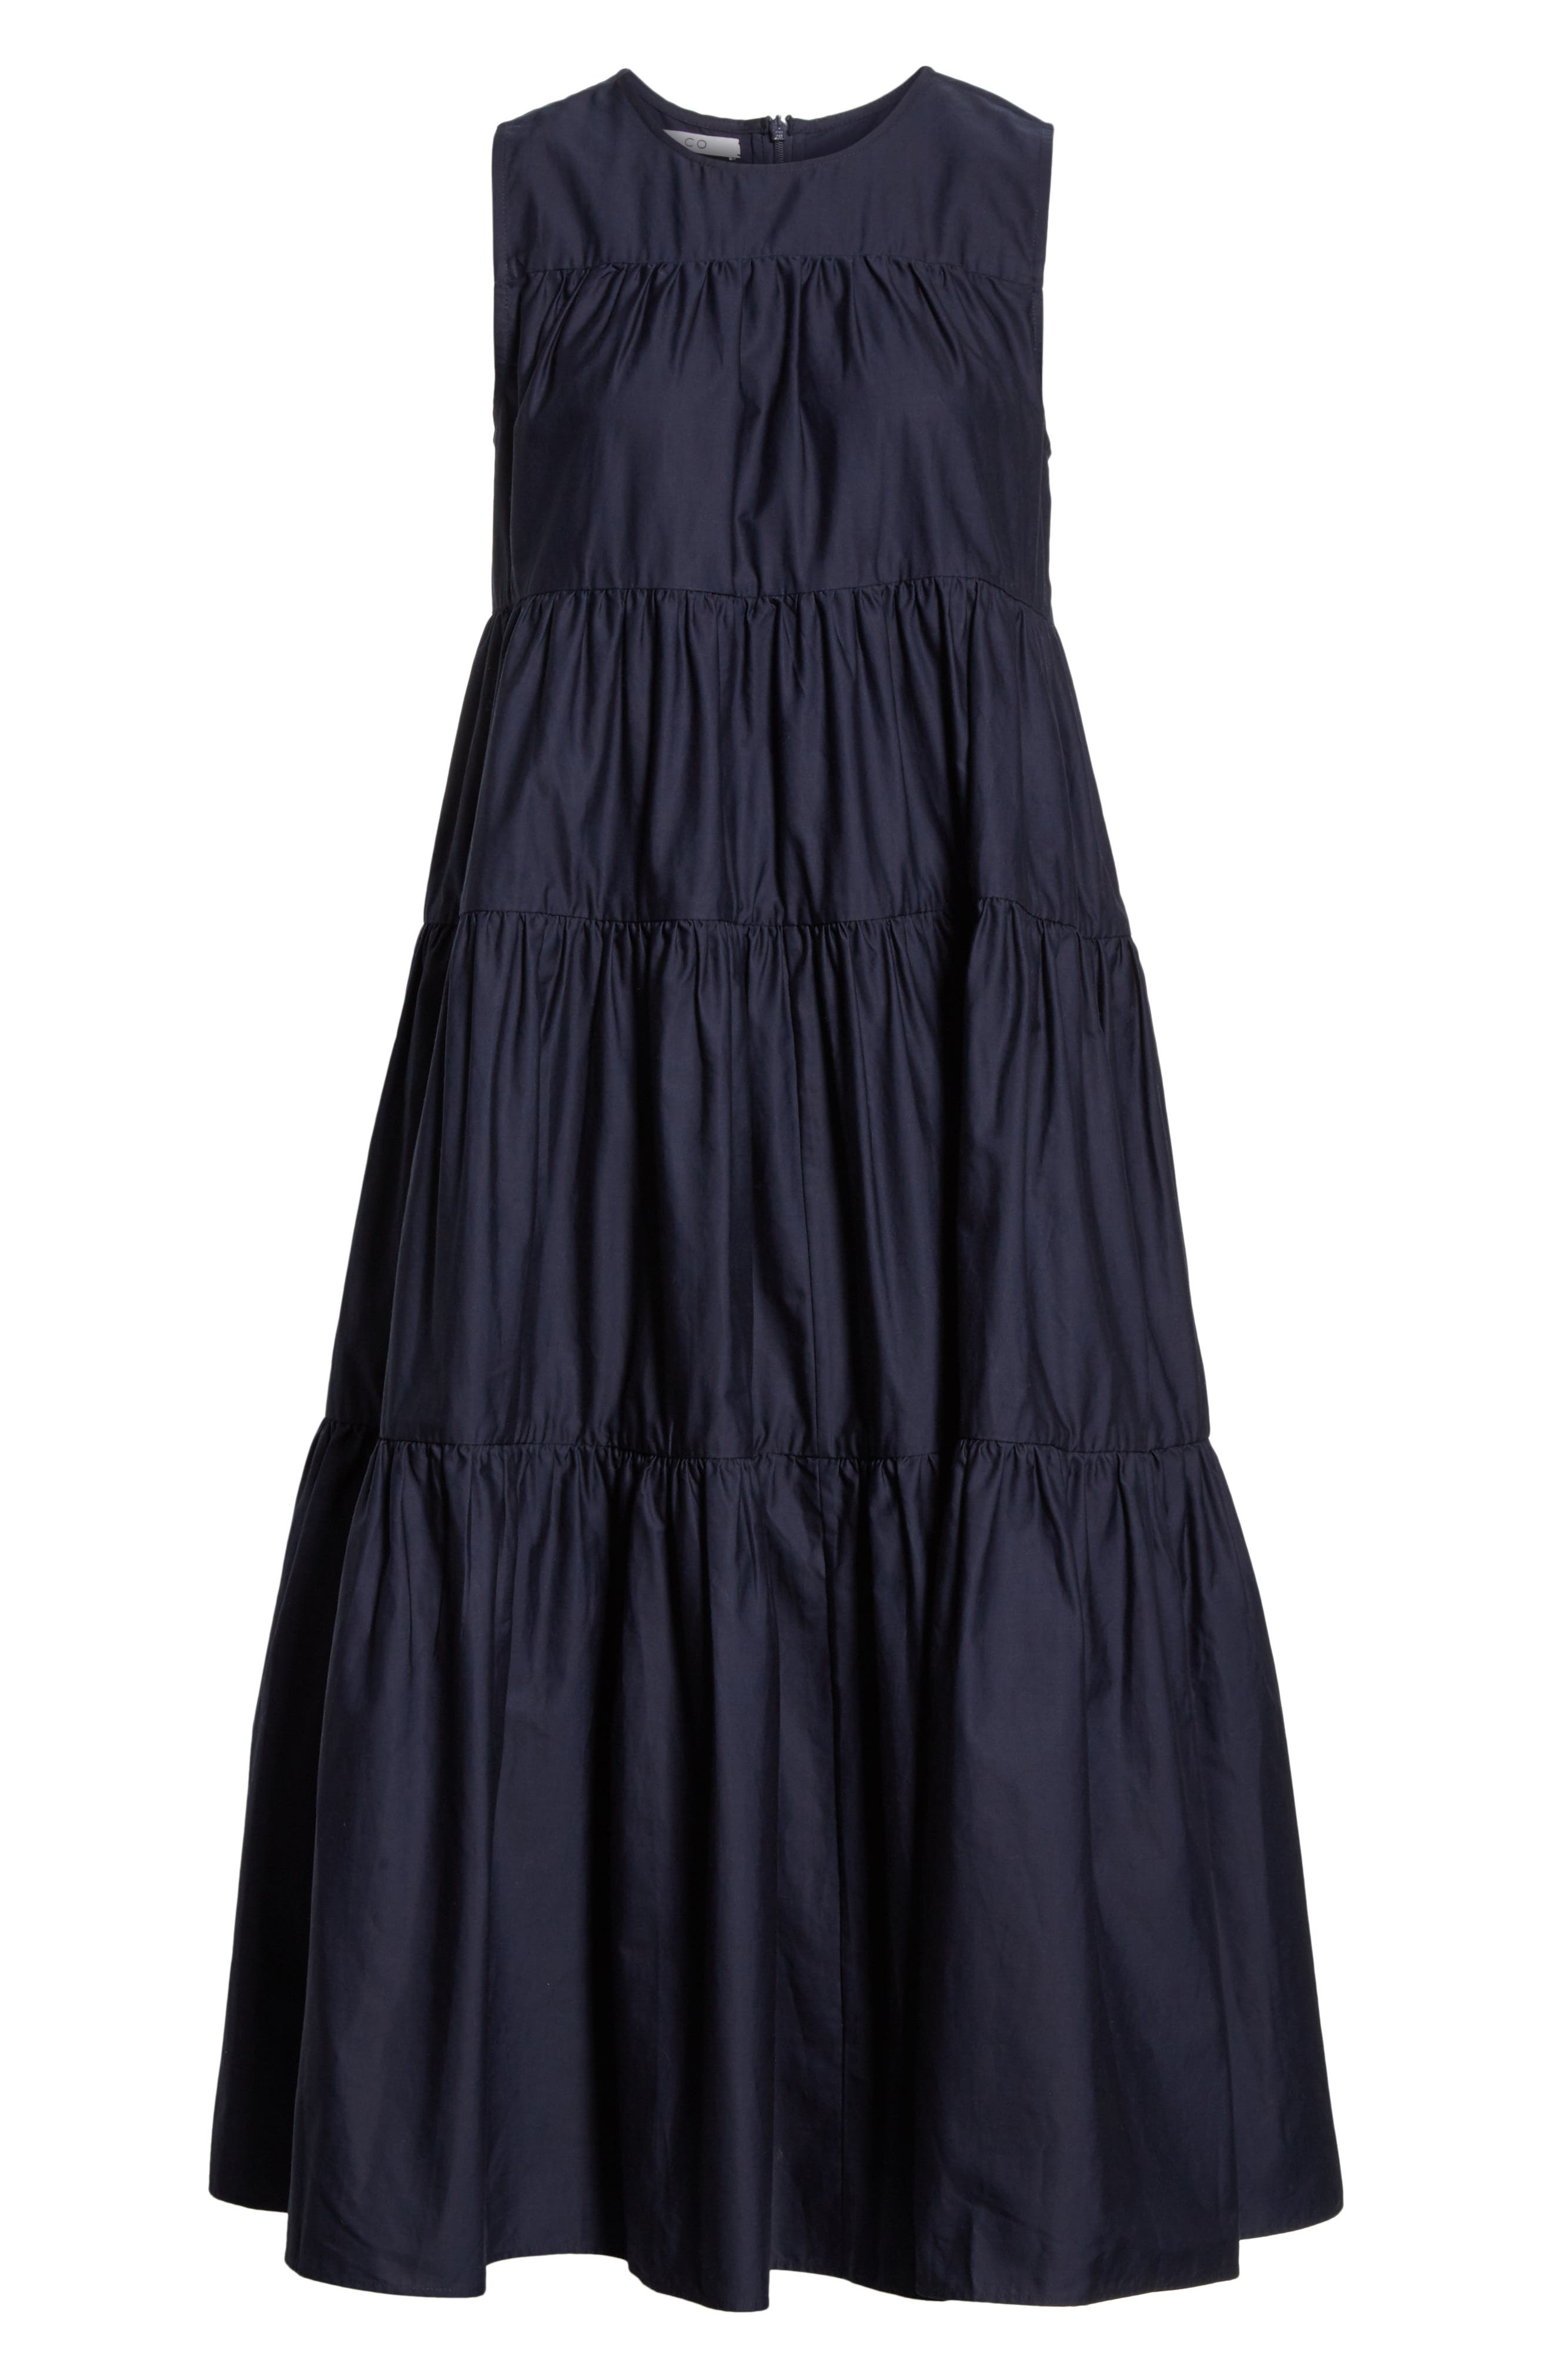 CO, Tiered Cotton Midi Dress, Alternate thumbnail 7, color, NAVY